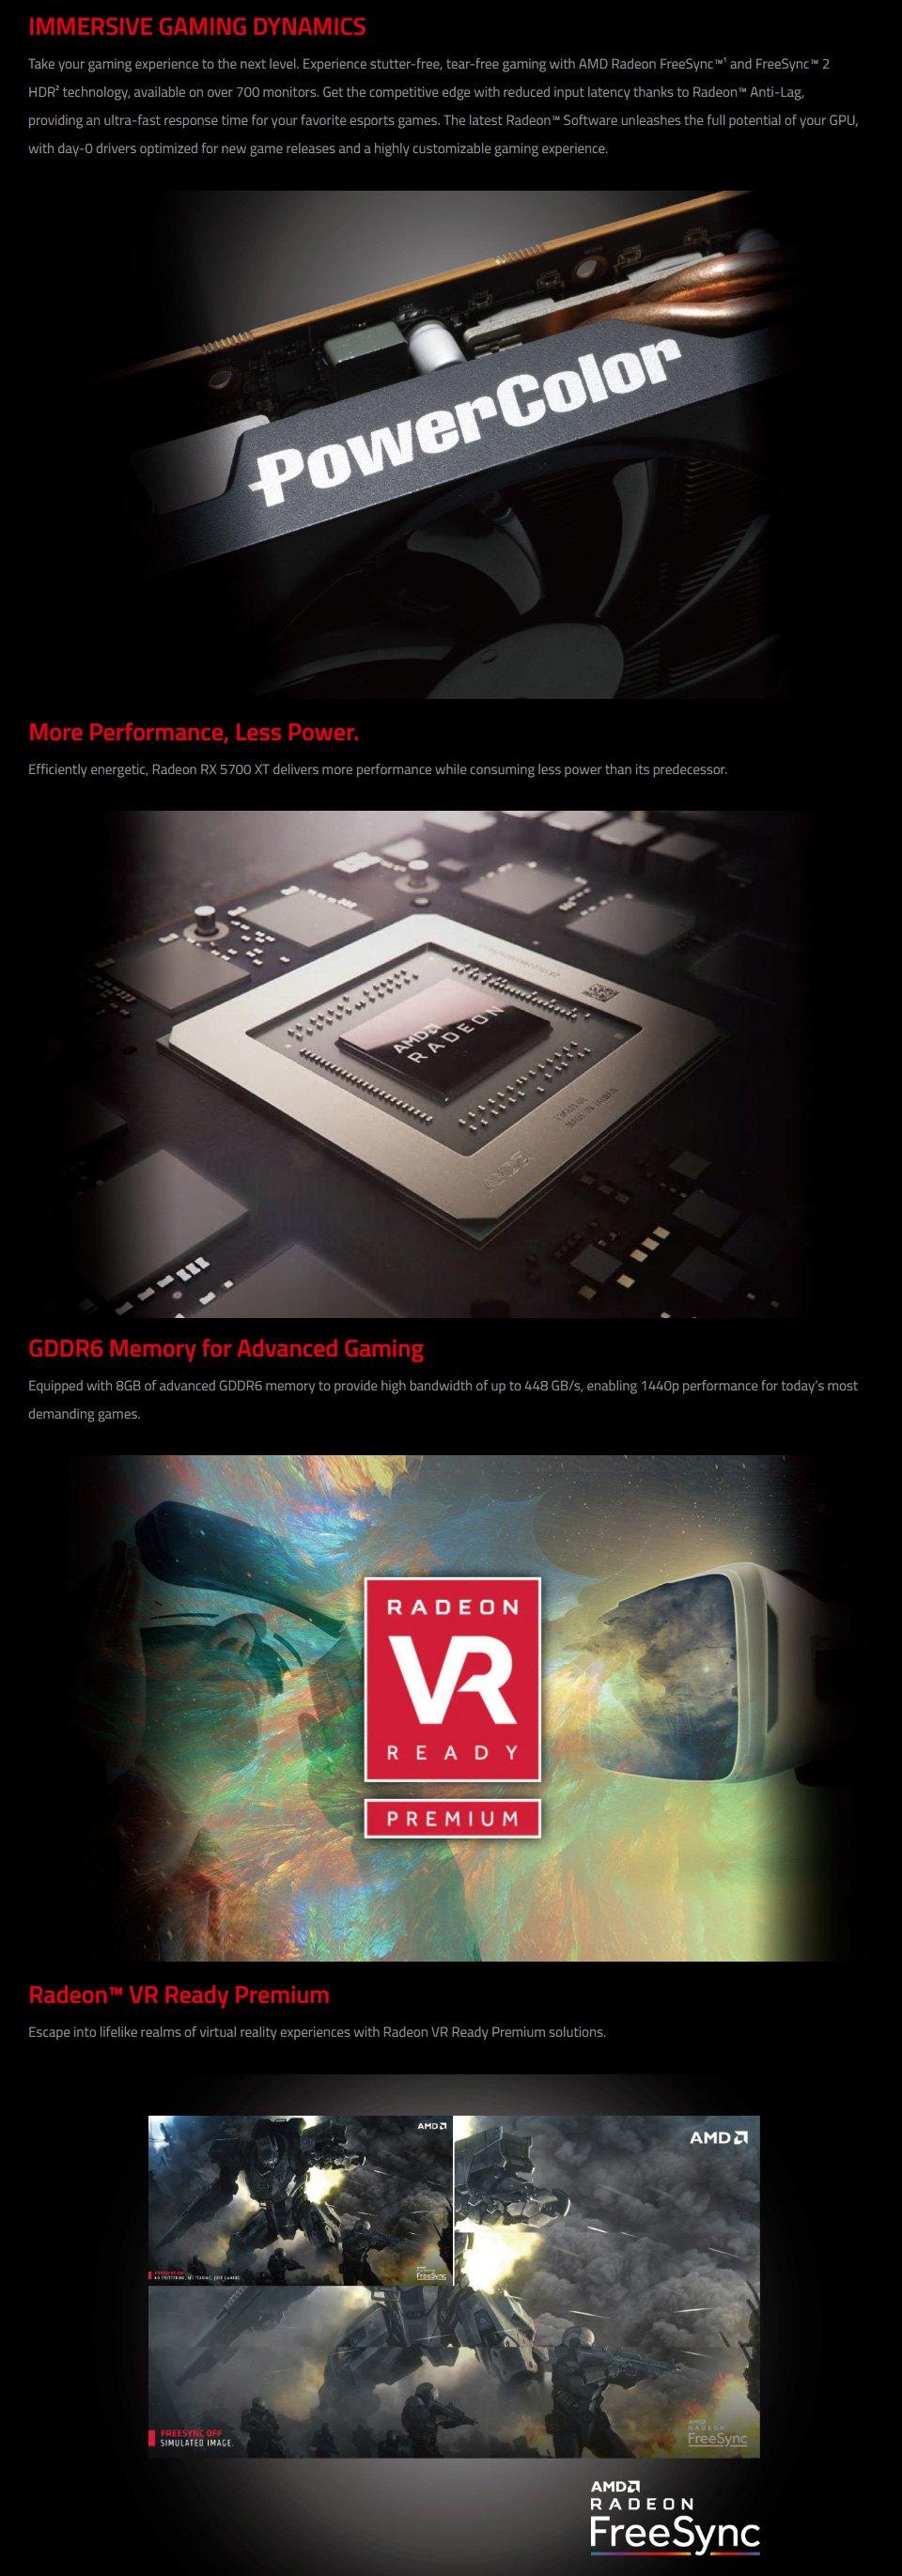 PowerColor Radeon RX 5700 XT 8GB features 2